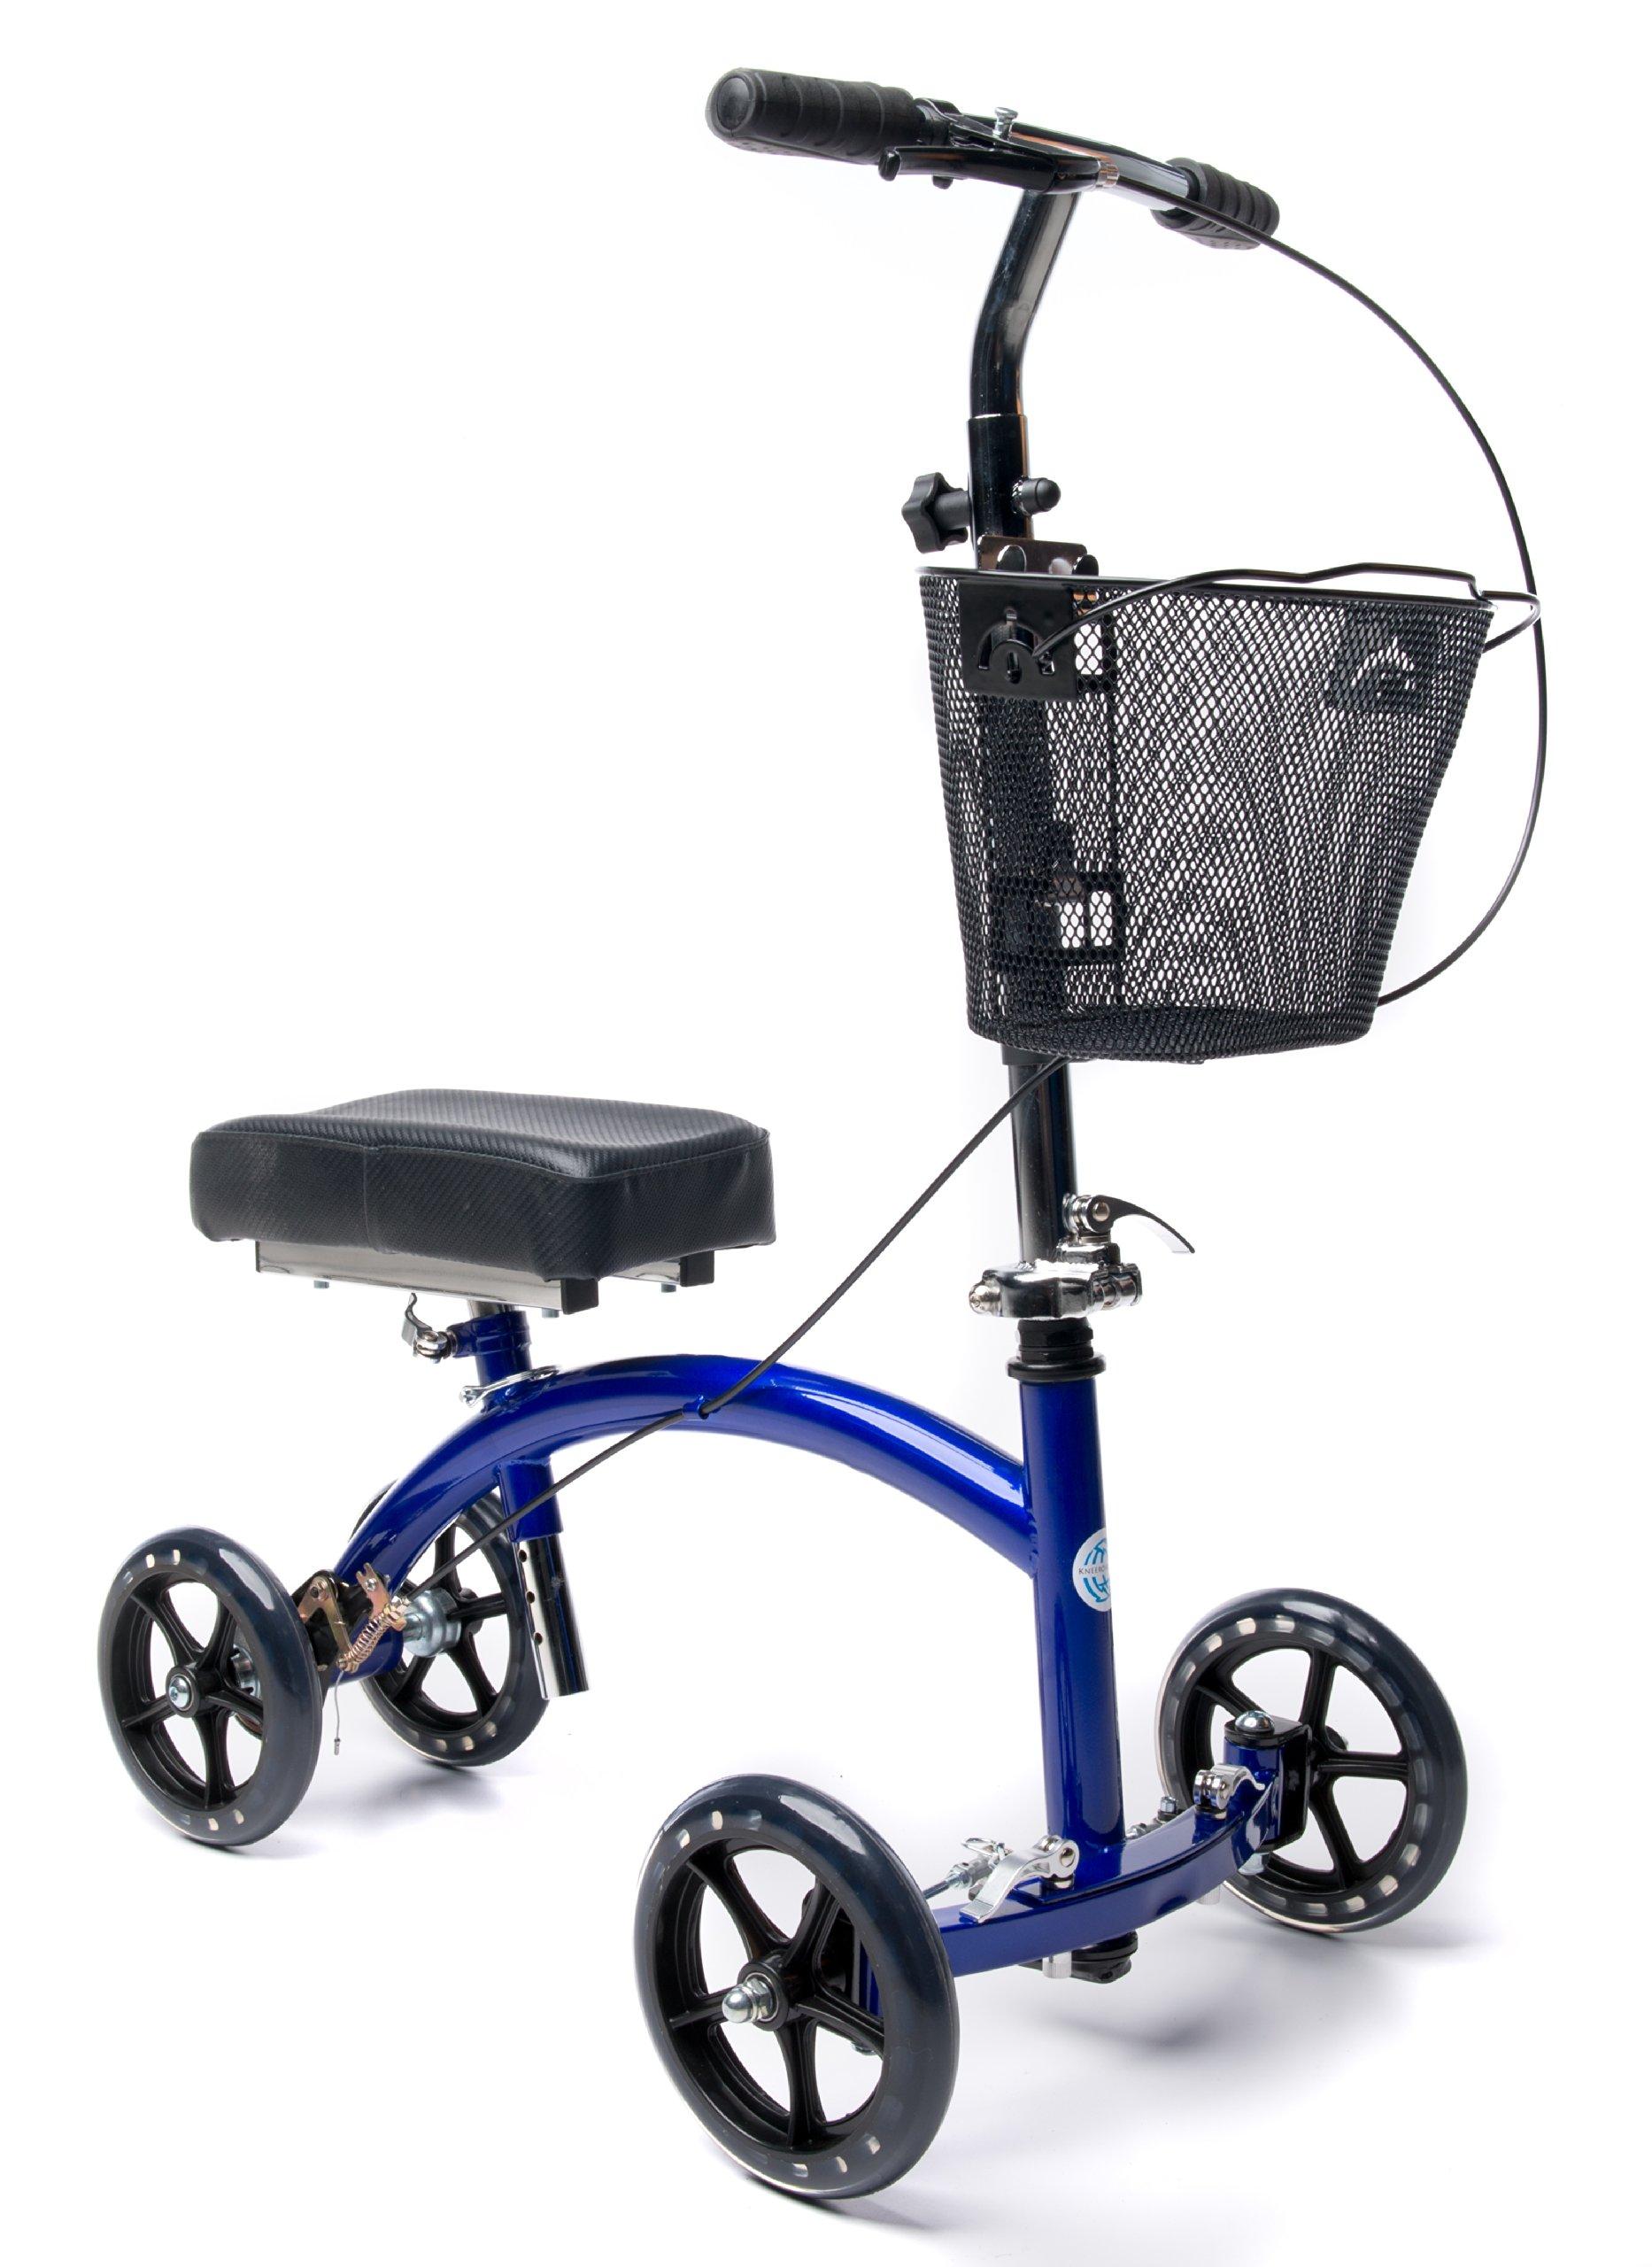 KneeRover Deluxe Steerable Knee Cycle Knee Walker  Scooter Crutch Alternative in Blue by KneeRover